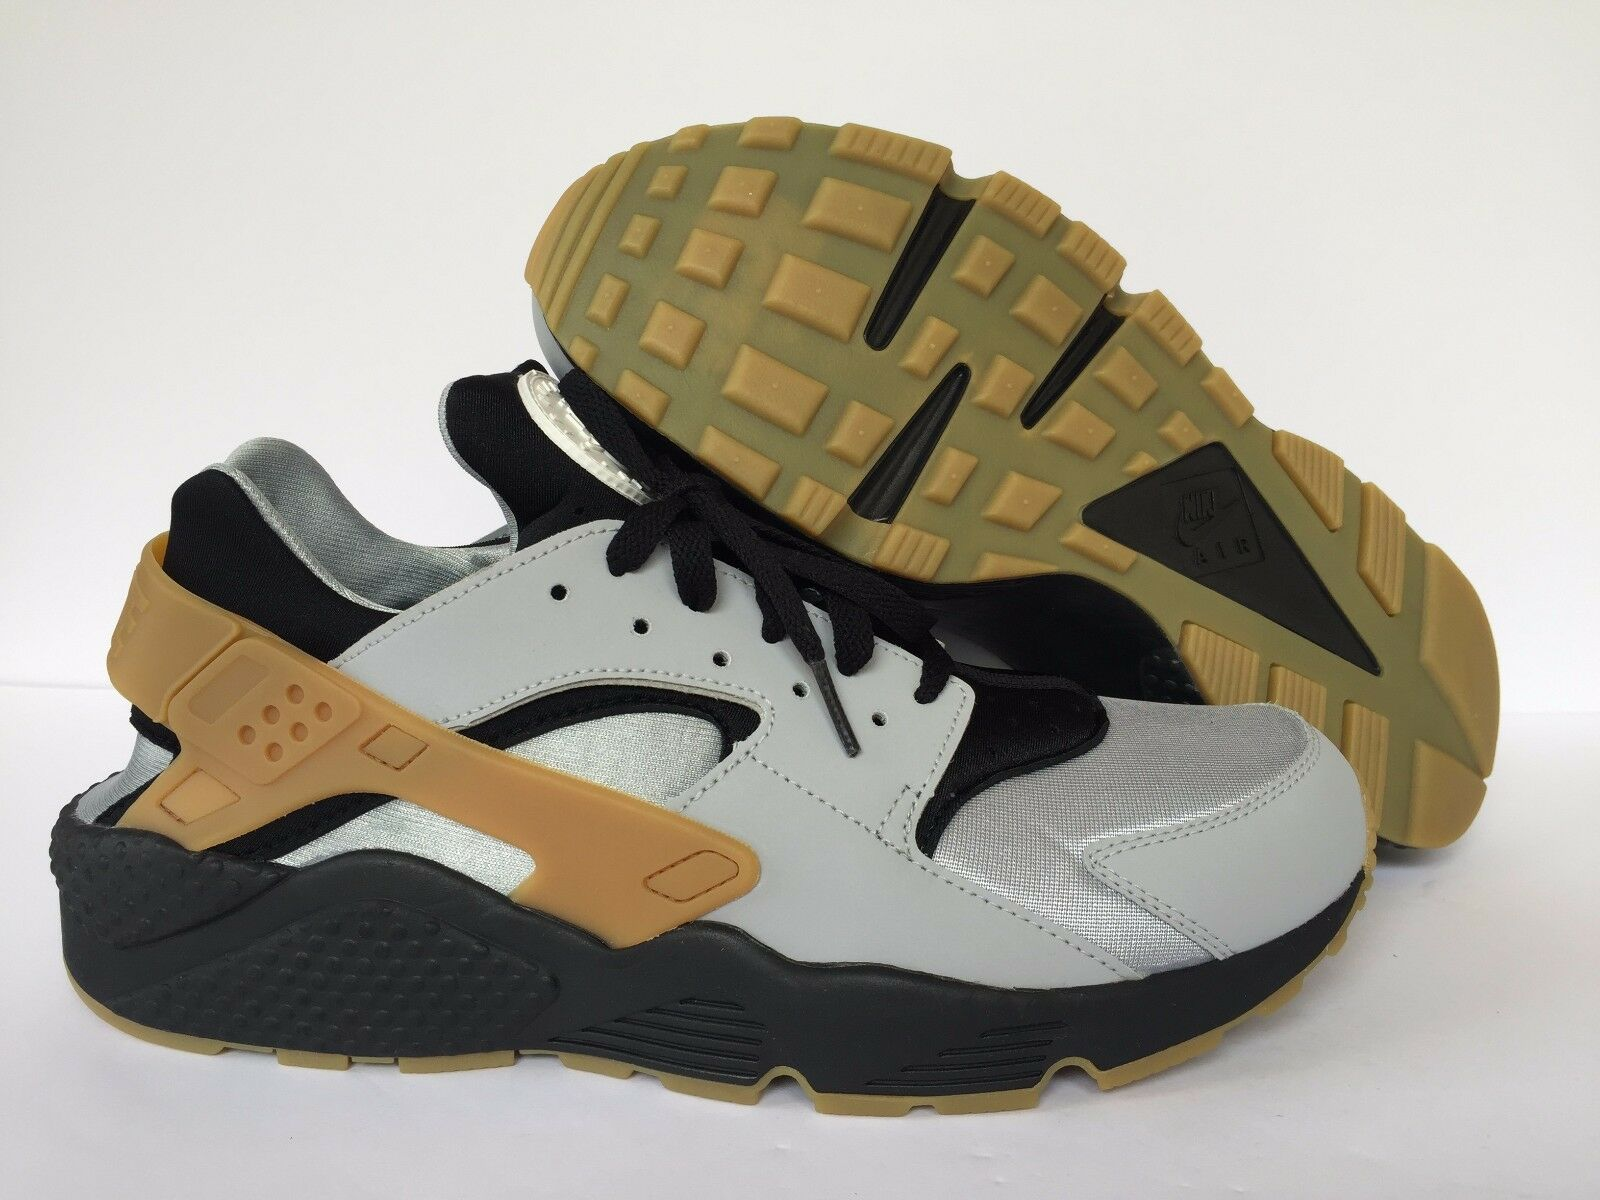 NIKE MEN AIR HUARACHE Nike iD Gray/Black New 777330-972 SZ US MEN 11.5